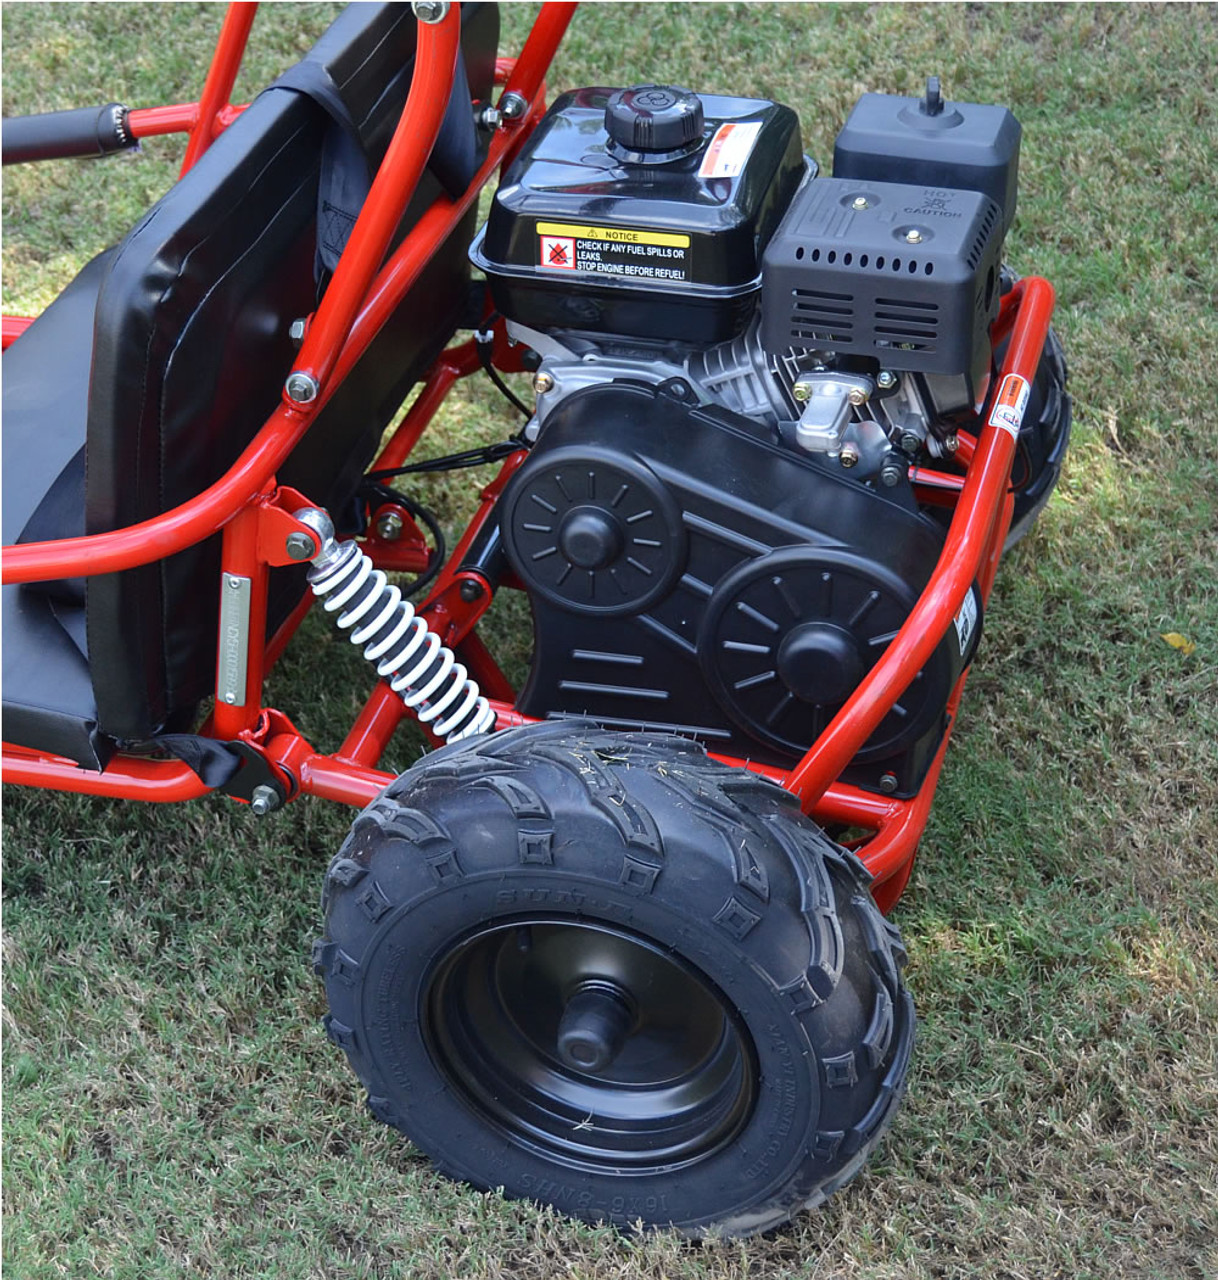 Gopowersports Standard Mid Size Go Kart Kit